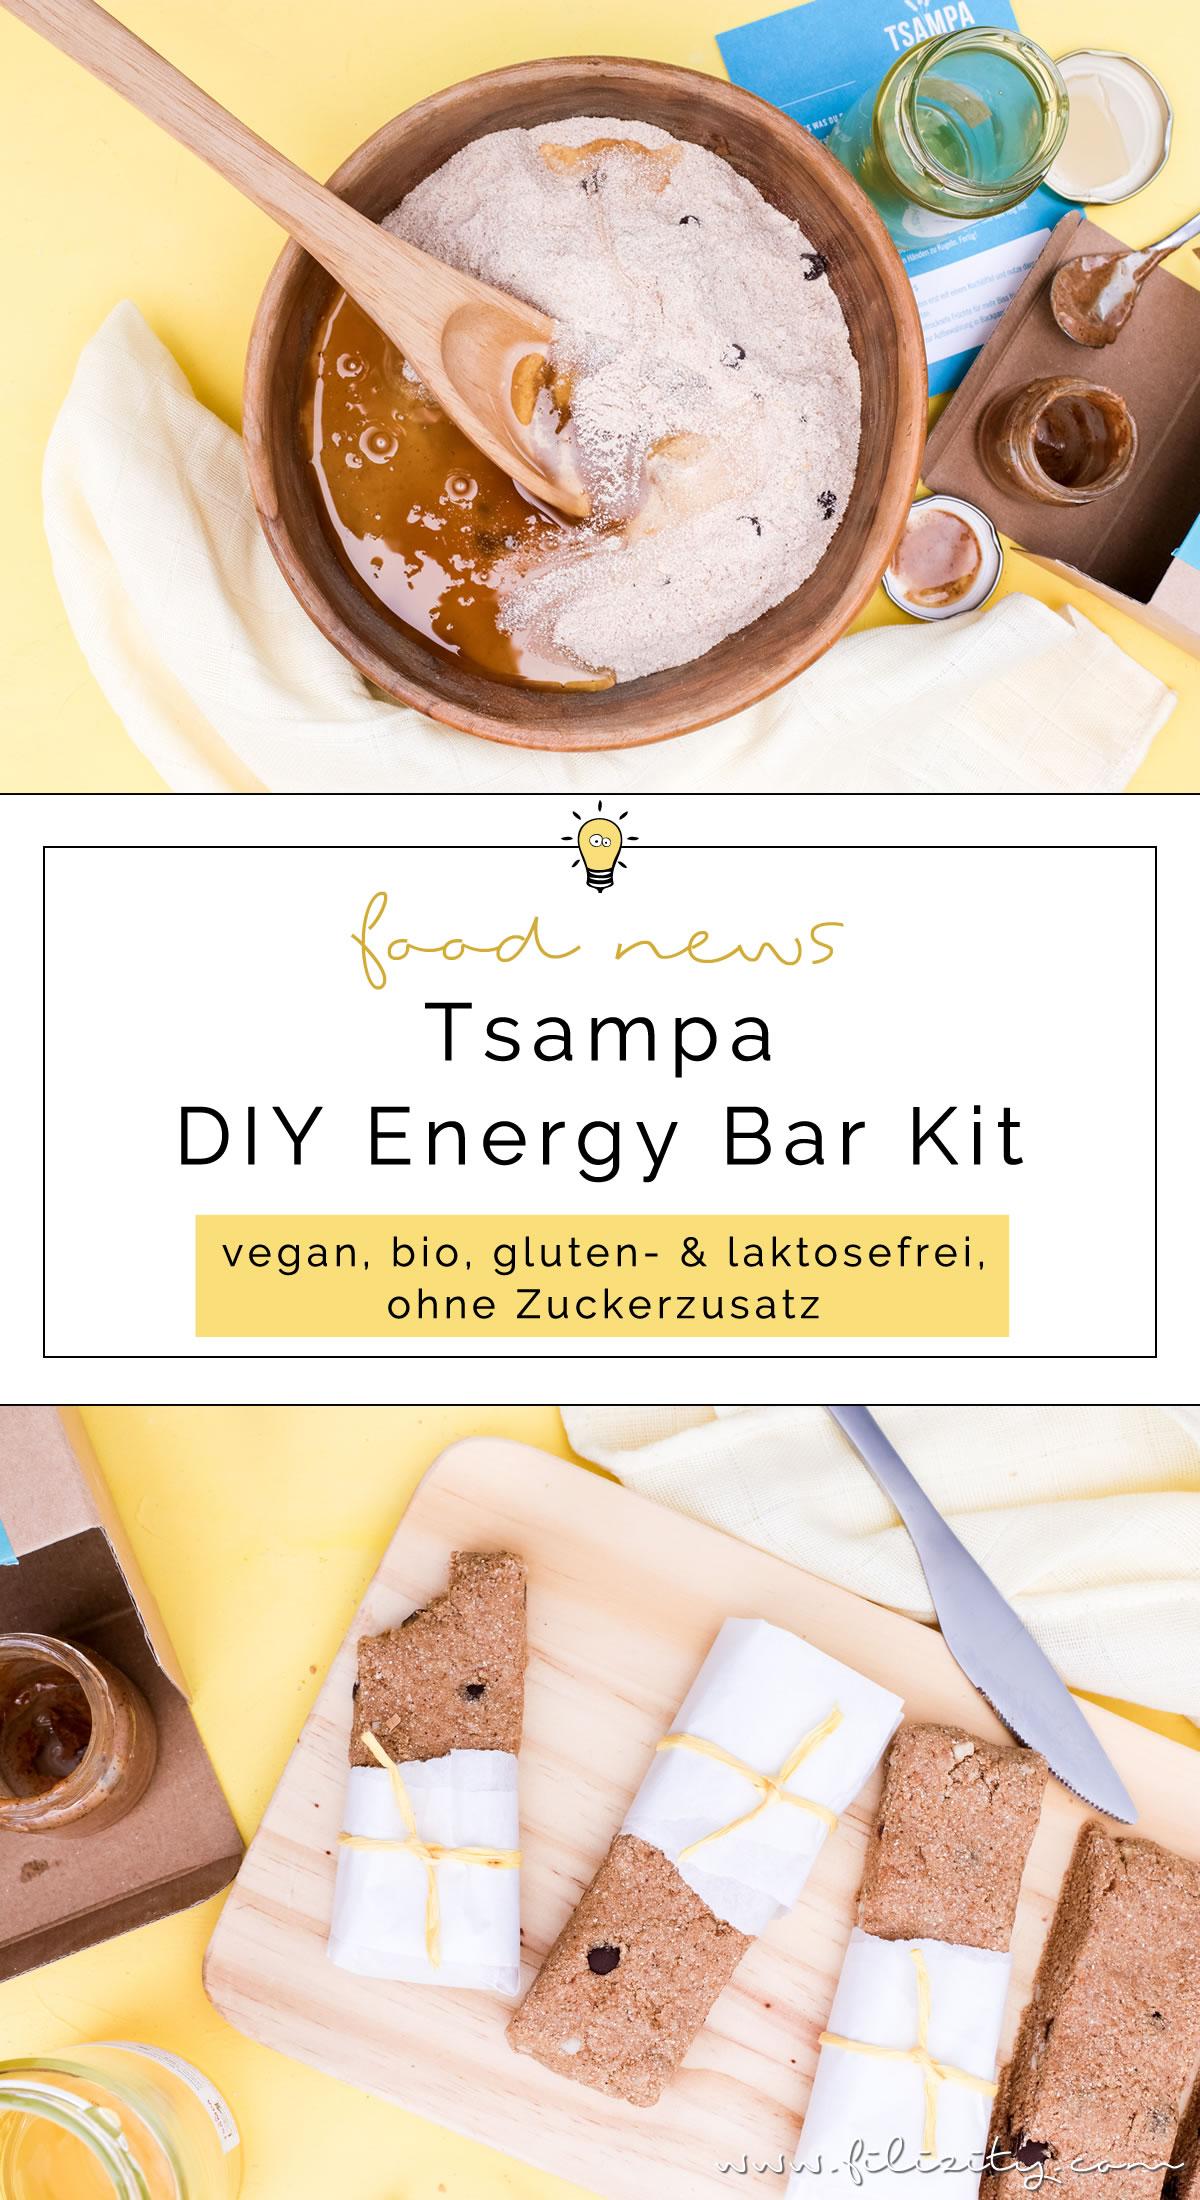 TSAMPA Energieriegel & DIY Energy Snack Set | Filizity.com | Food-Blog aus dem Rheinland #tsampa #energybar #vegan #glutenfrei #laktosefrei #bio